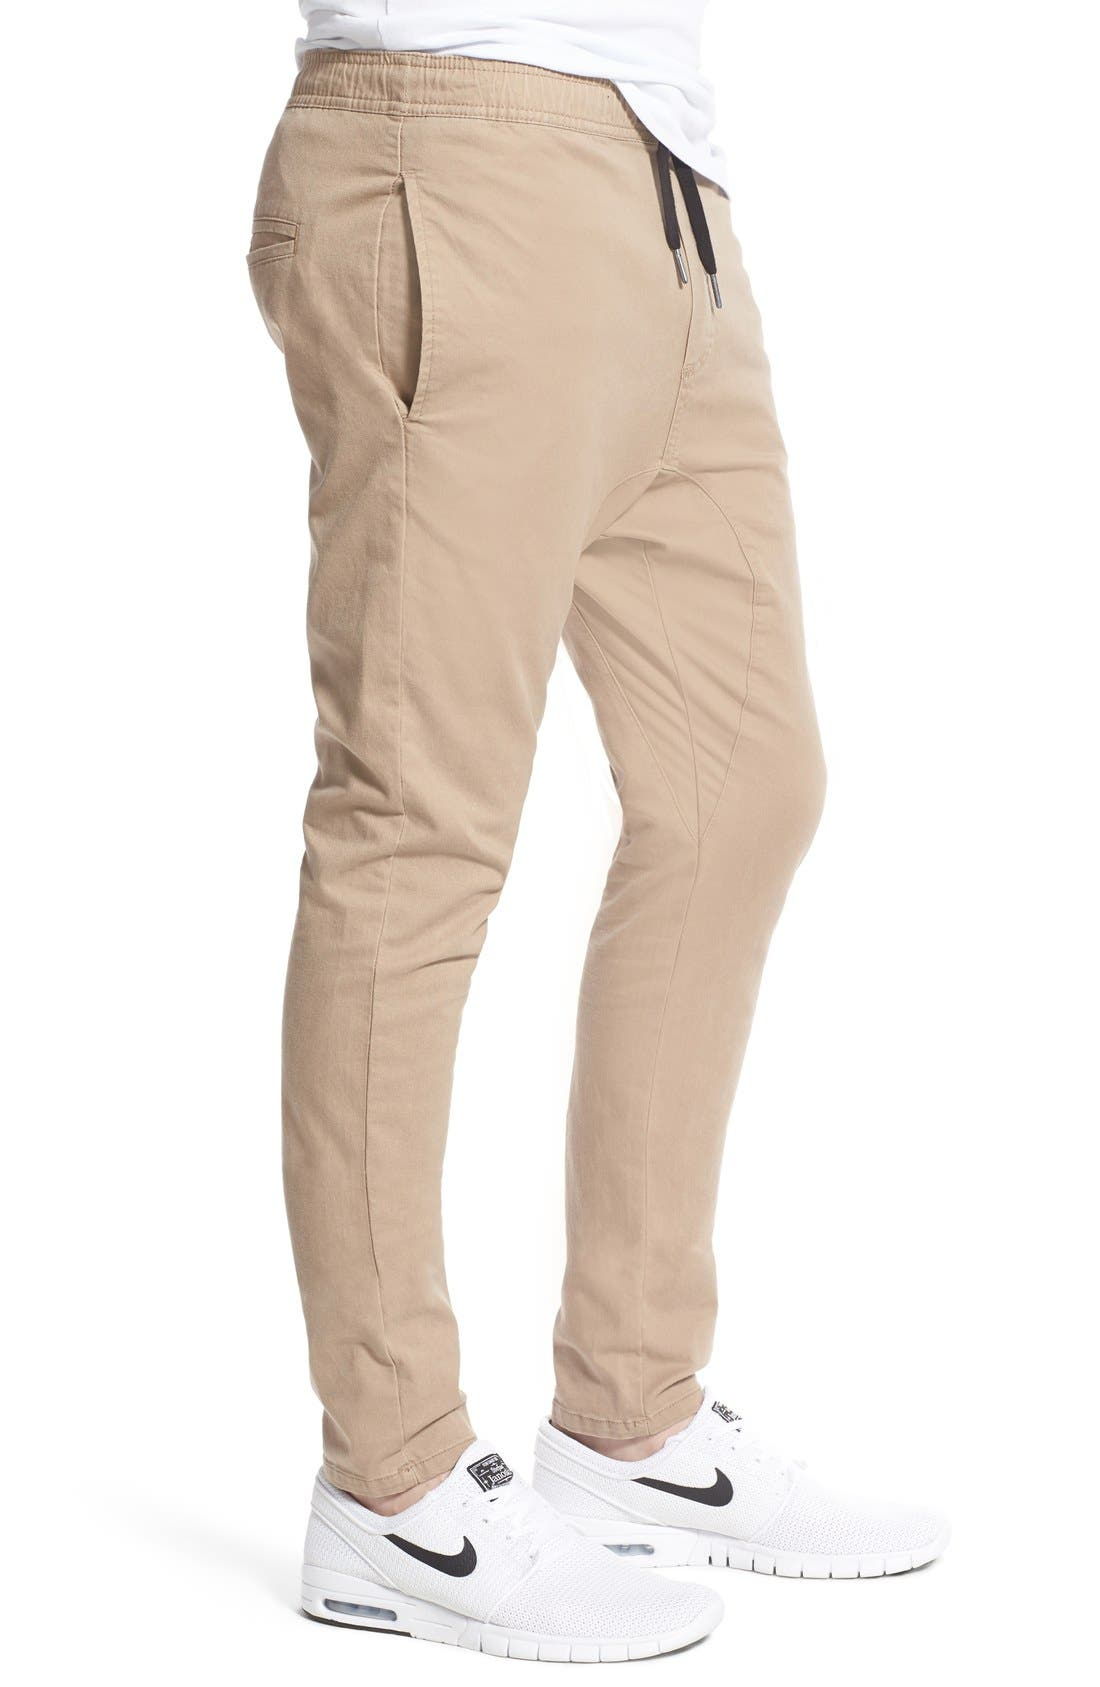 Salerno Stretch Woven Jogger Pants,                             Alternate thumbnail 32, color,